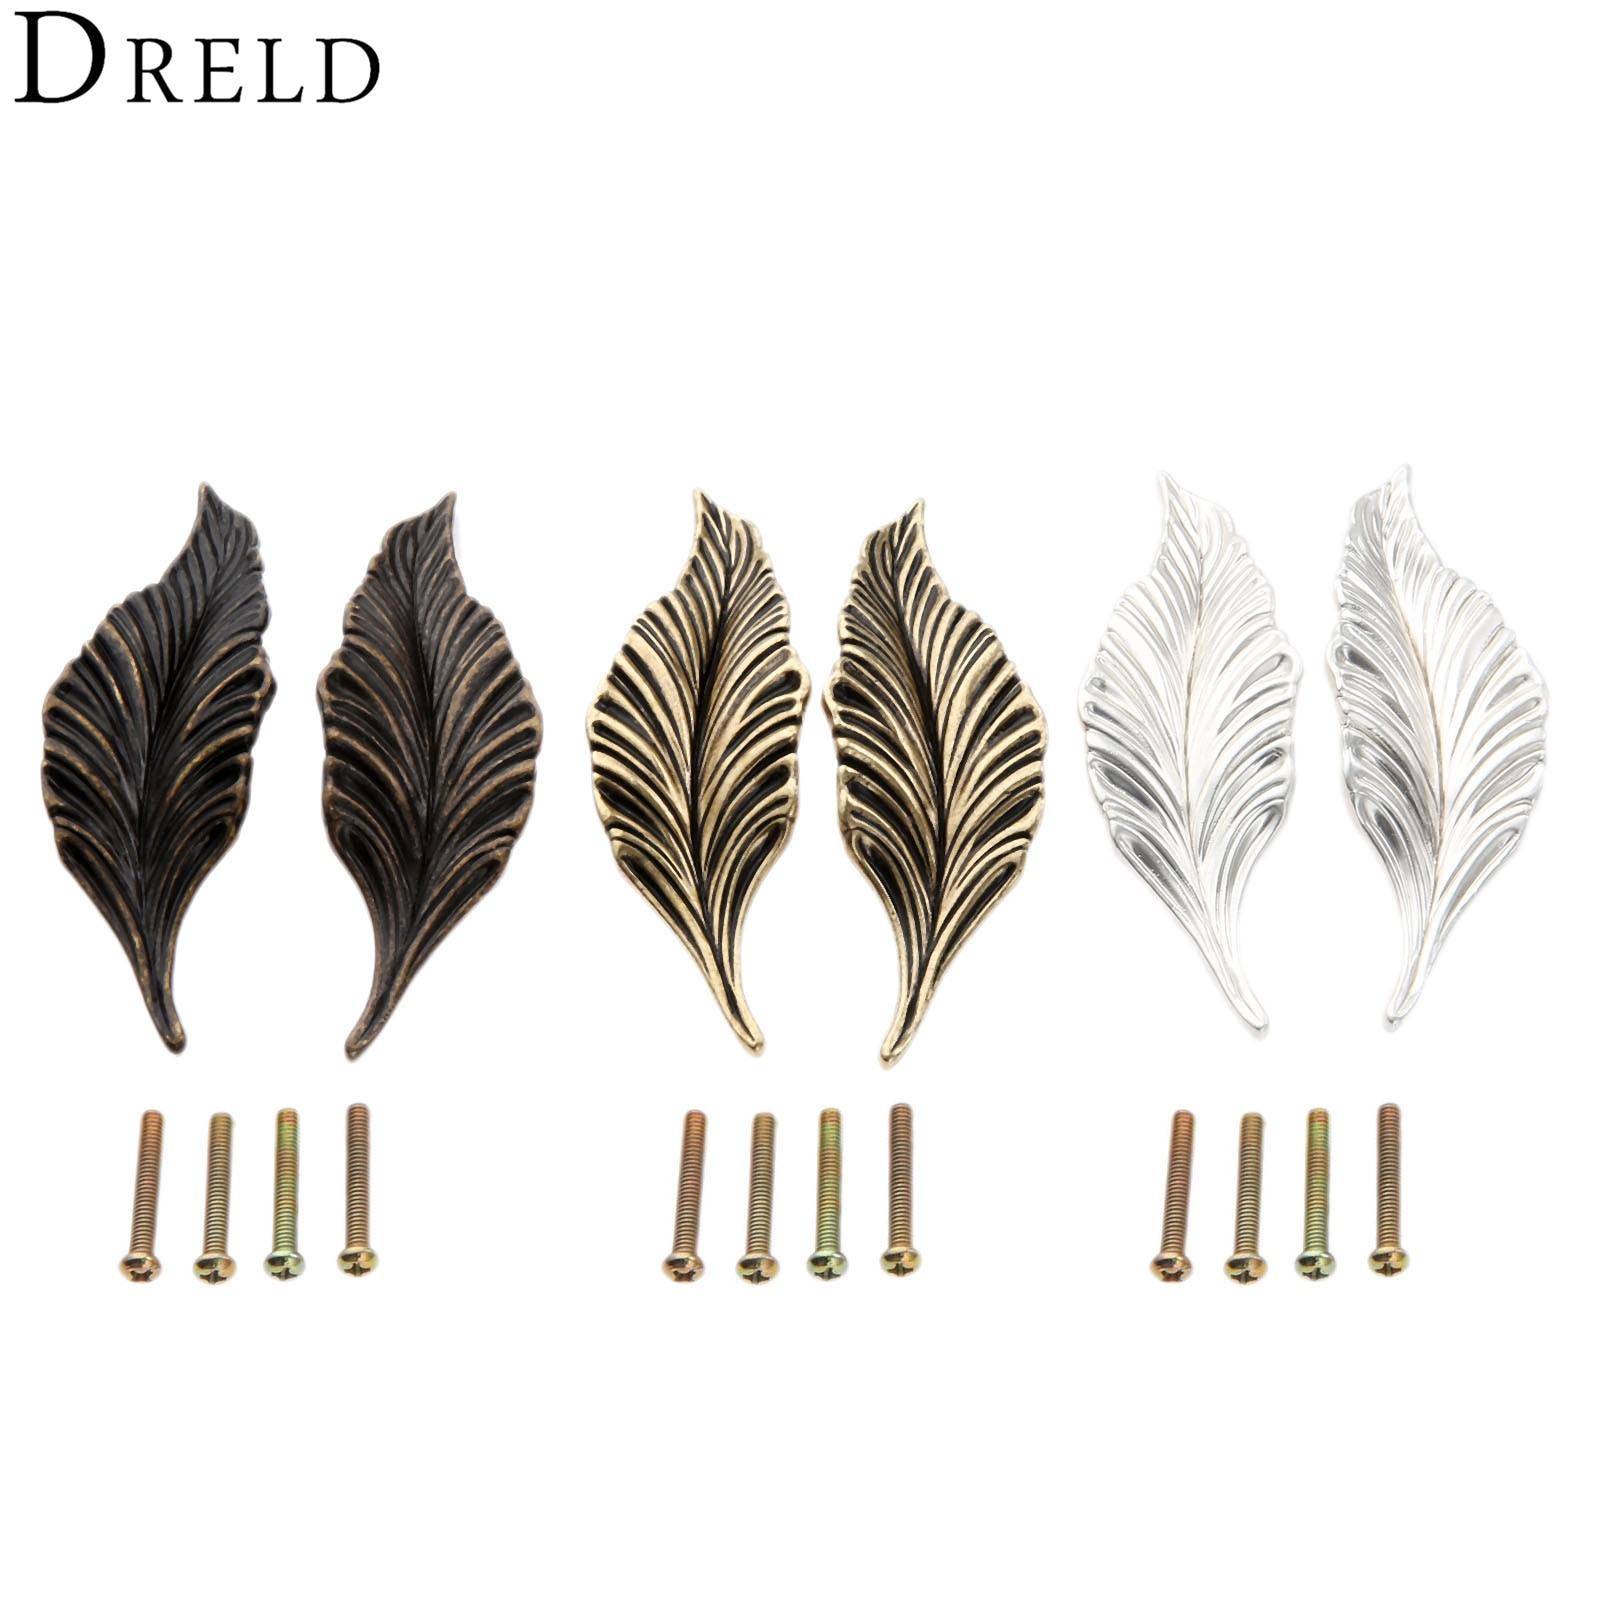 DRELD 2Pcs Novelty Leaves Furniture Handles Cabinet Knobs and Handles Drawer Wardrobe Door Kitchen Handle Furniture Hardware